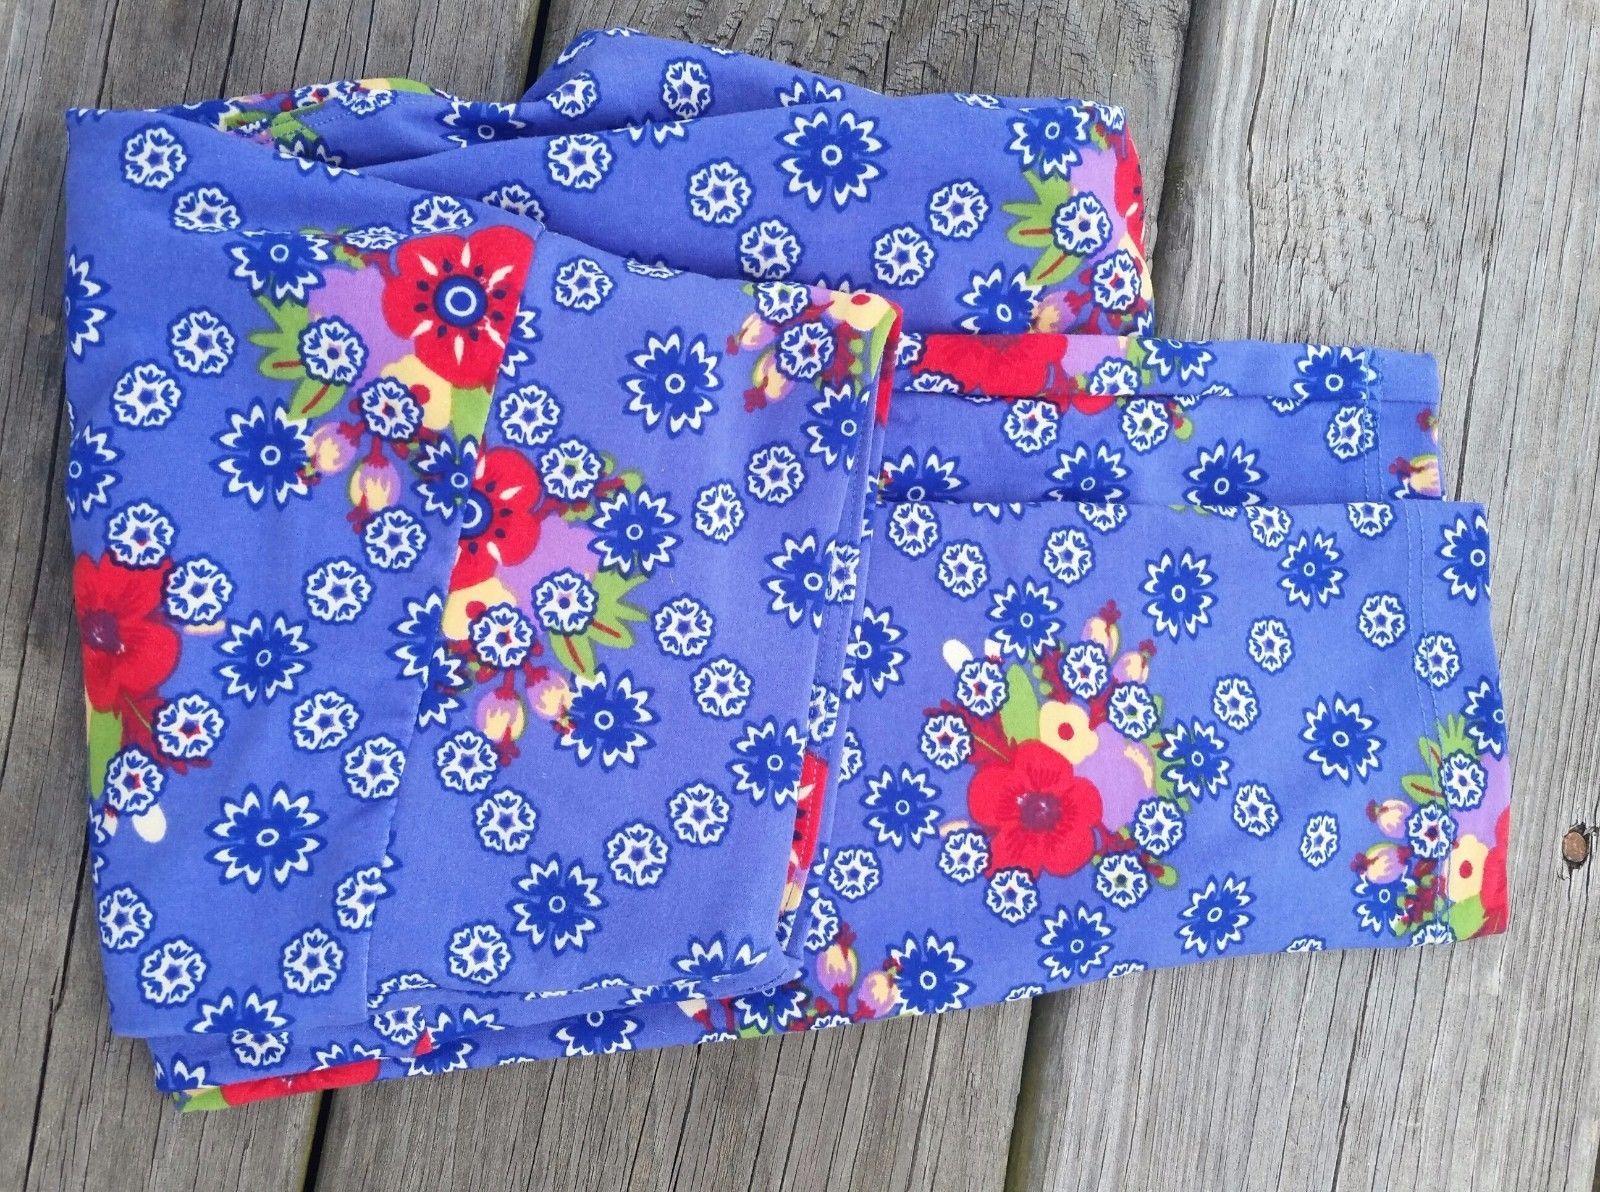 Lularoe OS One size Purpley Blue Floral Leggings Brand New So Cute!